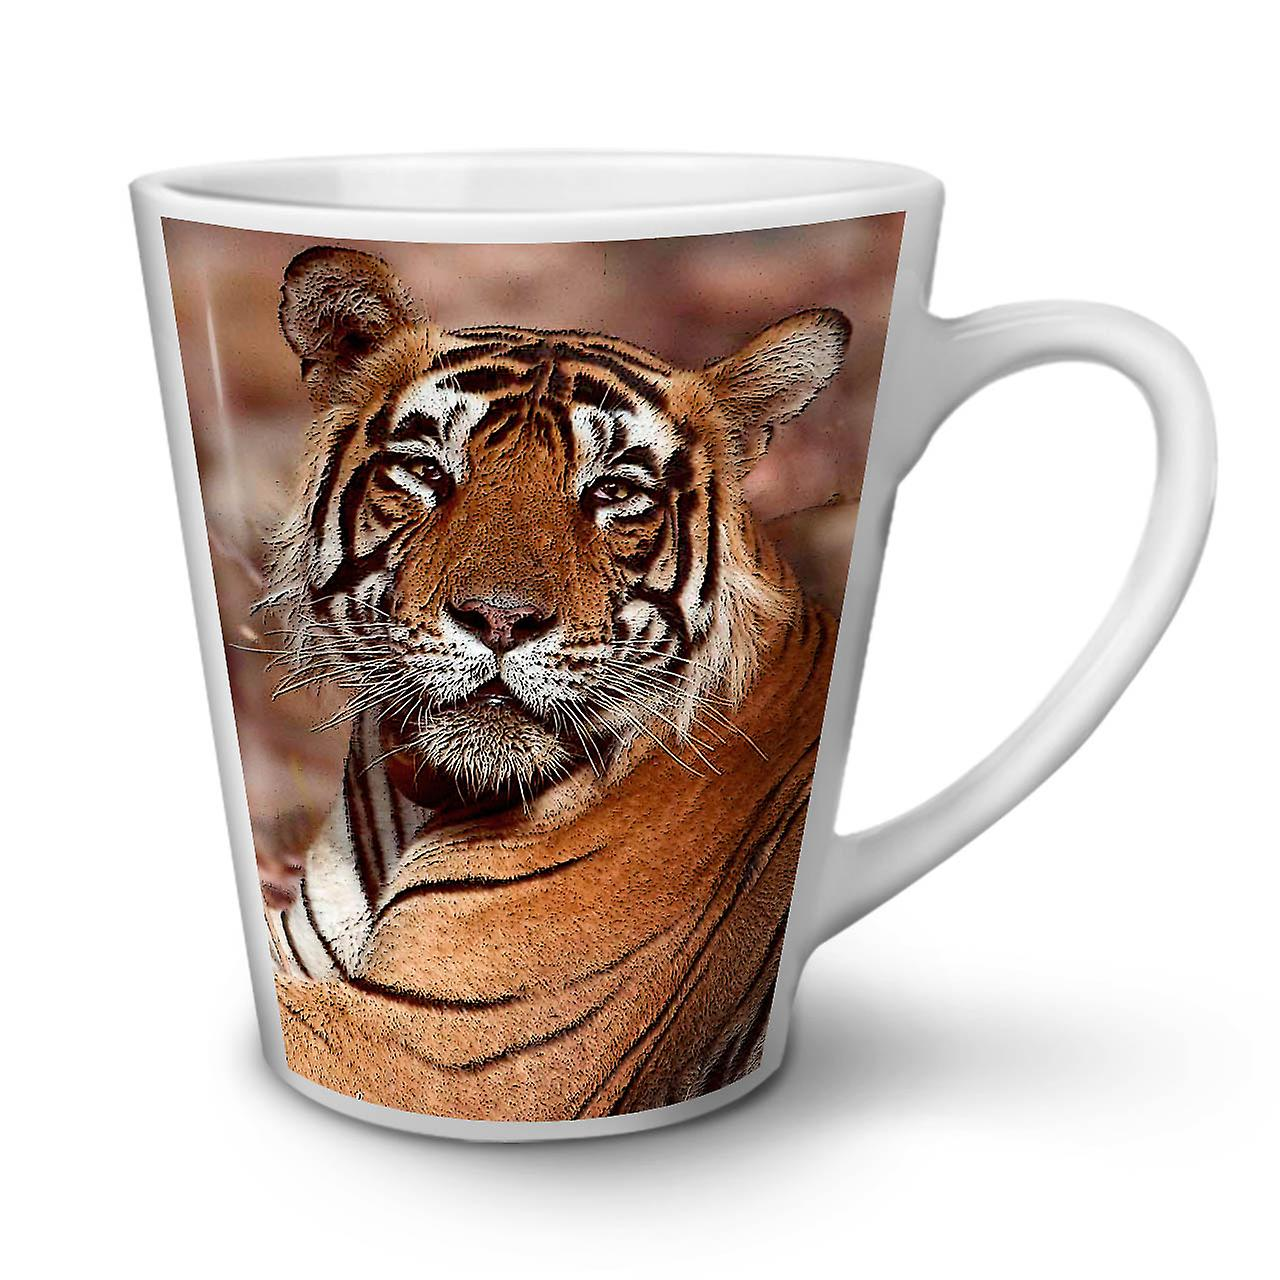 Latte OzWellcoda Blanche 12 Tigre Chat En Photo Tasse Café Céramique Animaux Nouvelle nwPkX80O